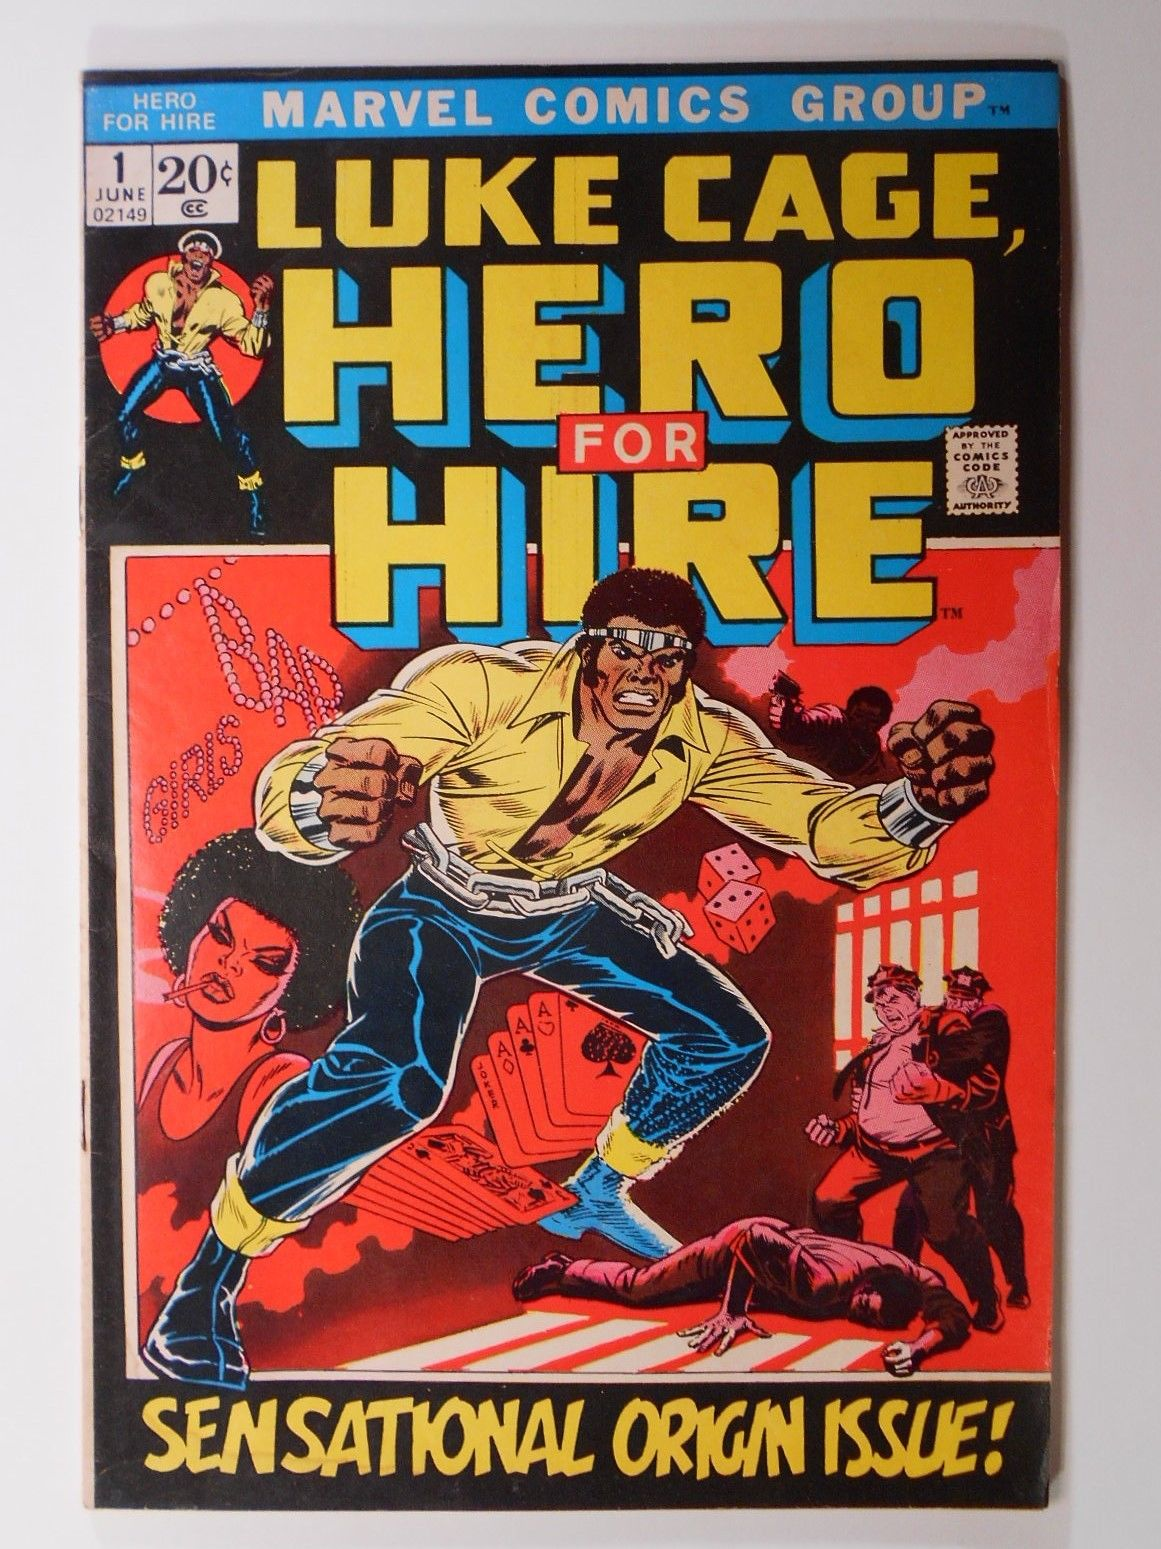 LUKE CAGE, HERO FOR HIRE 1 (Marvel 1972) KEY #1 Origin Issue Netflix - Power Man